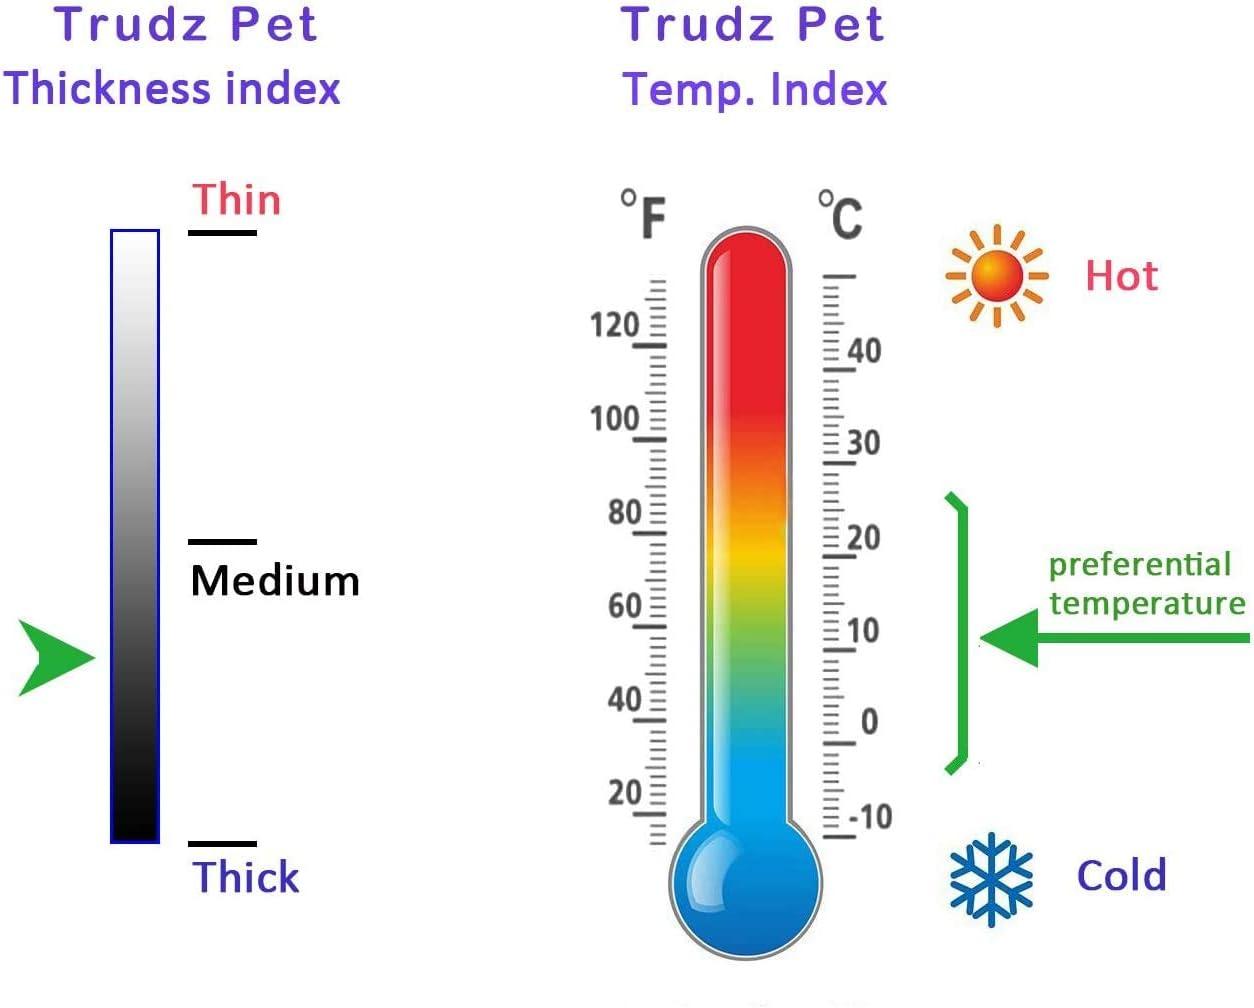 Cotton Jacket Coat for Samll Dog /& Medium Dog /& Cat Trudz PET Security Dog Hoodies Rdc Pet Apparel Autumn /& Winter Sweatshirt Warm Sweater